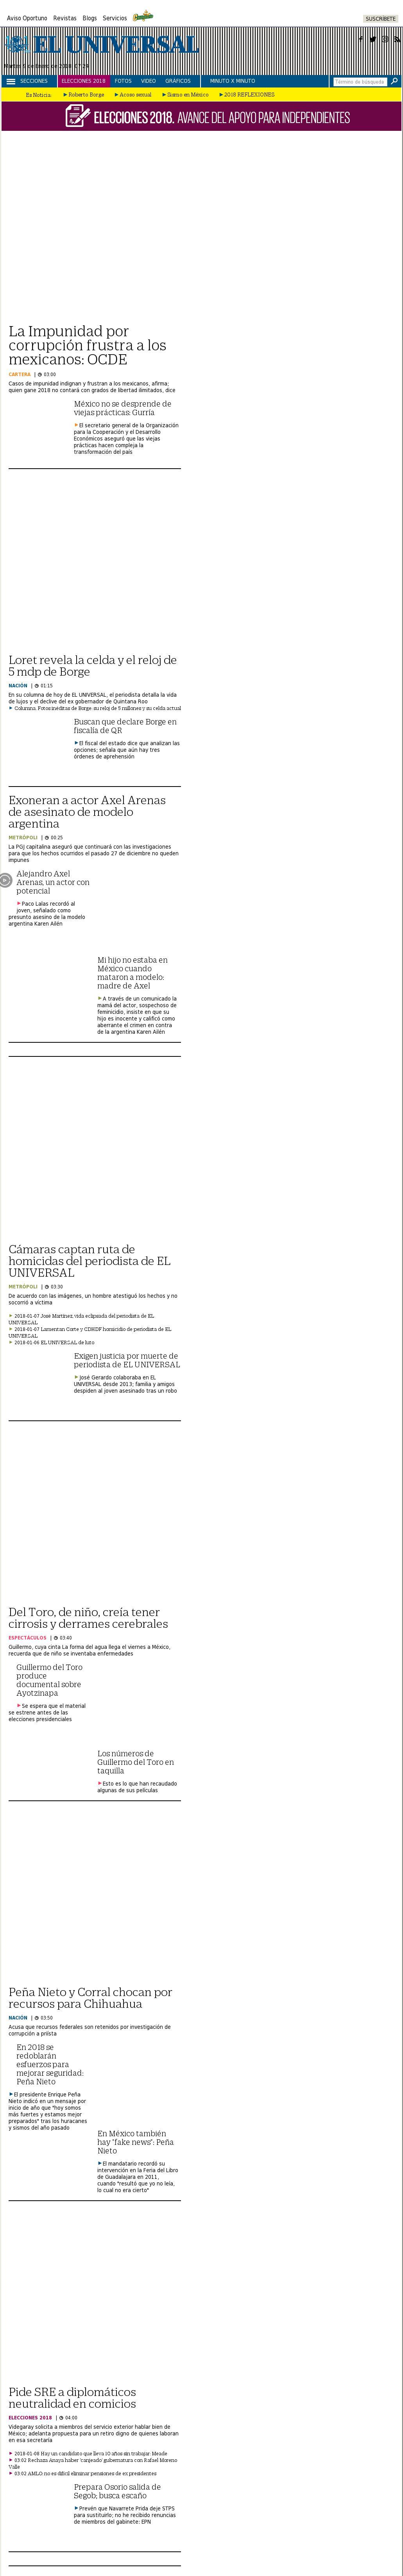 El Universal at Tuesday Jan. 9, 2018, 1:25 p.m. UTC